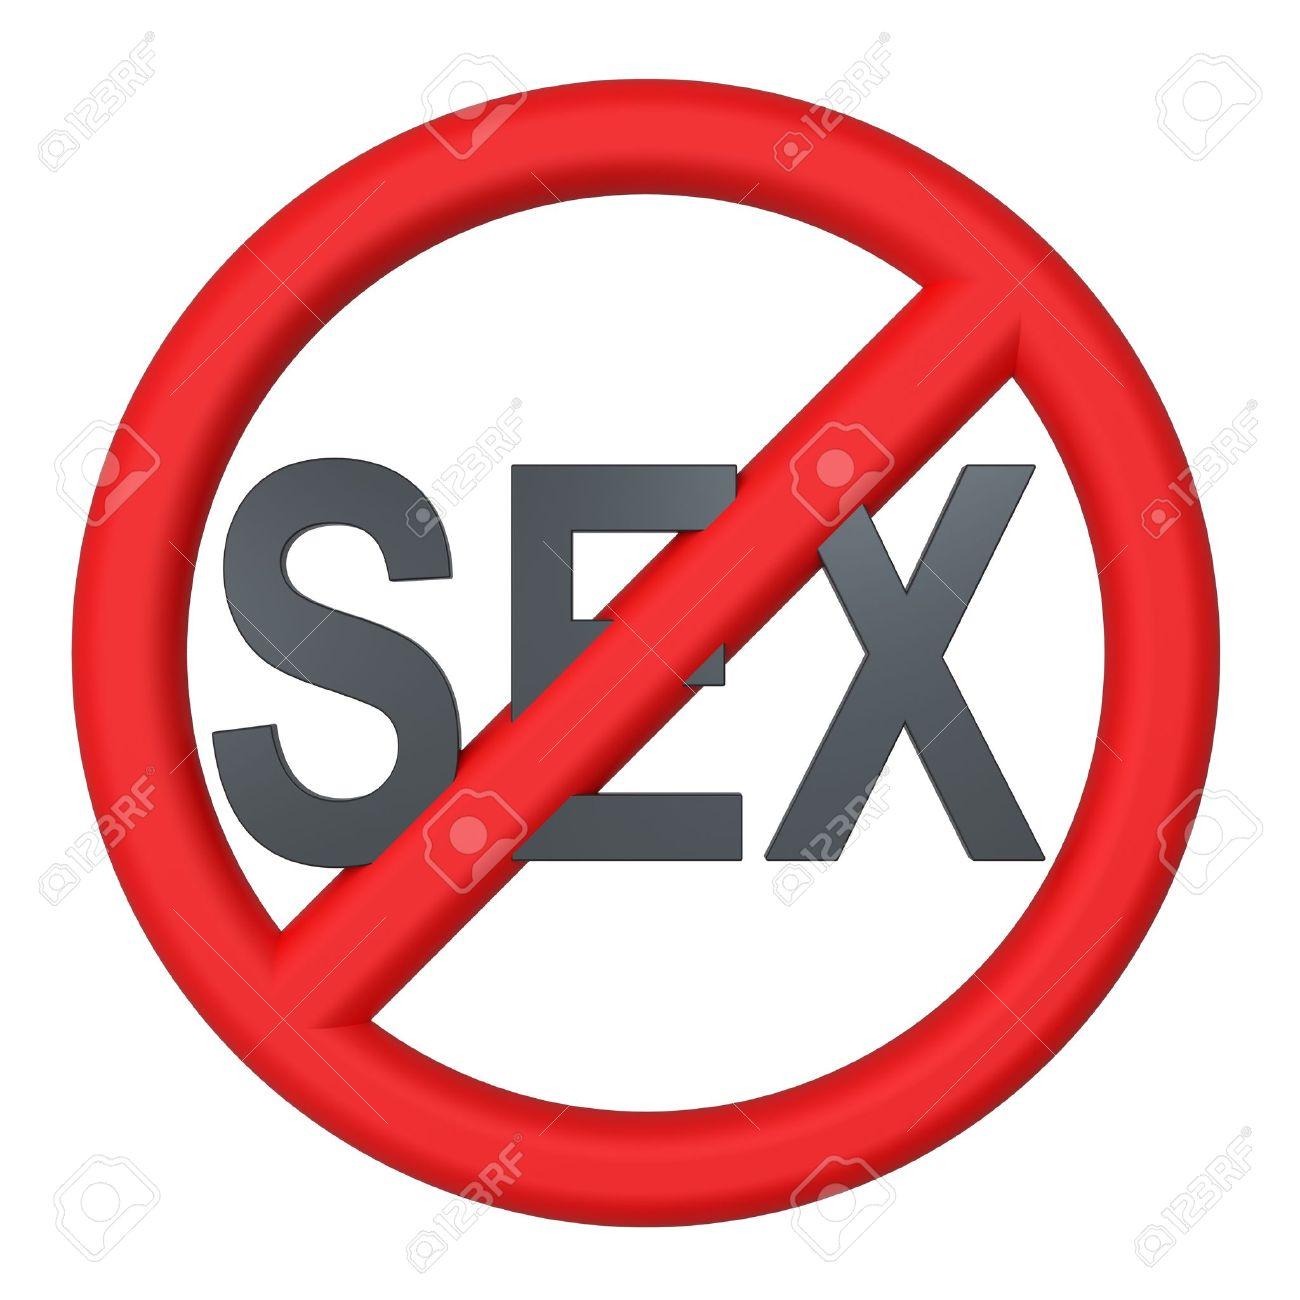 No sex sign